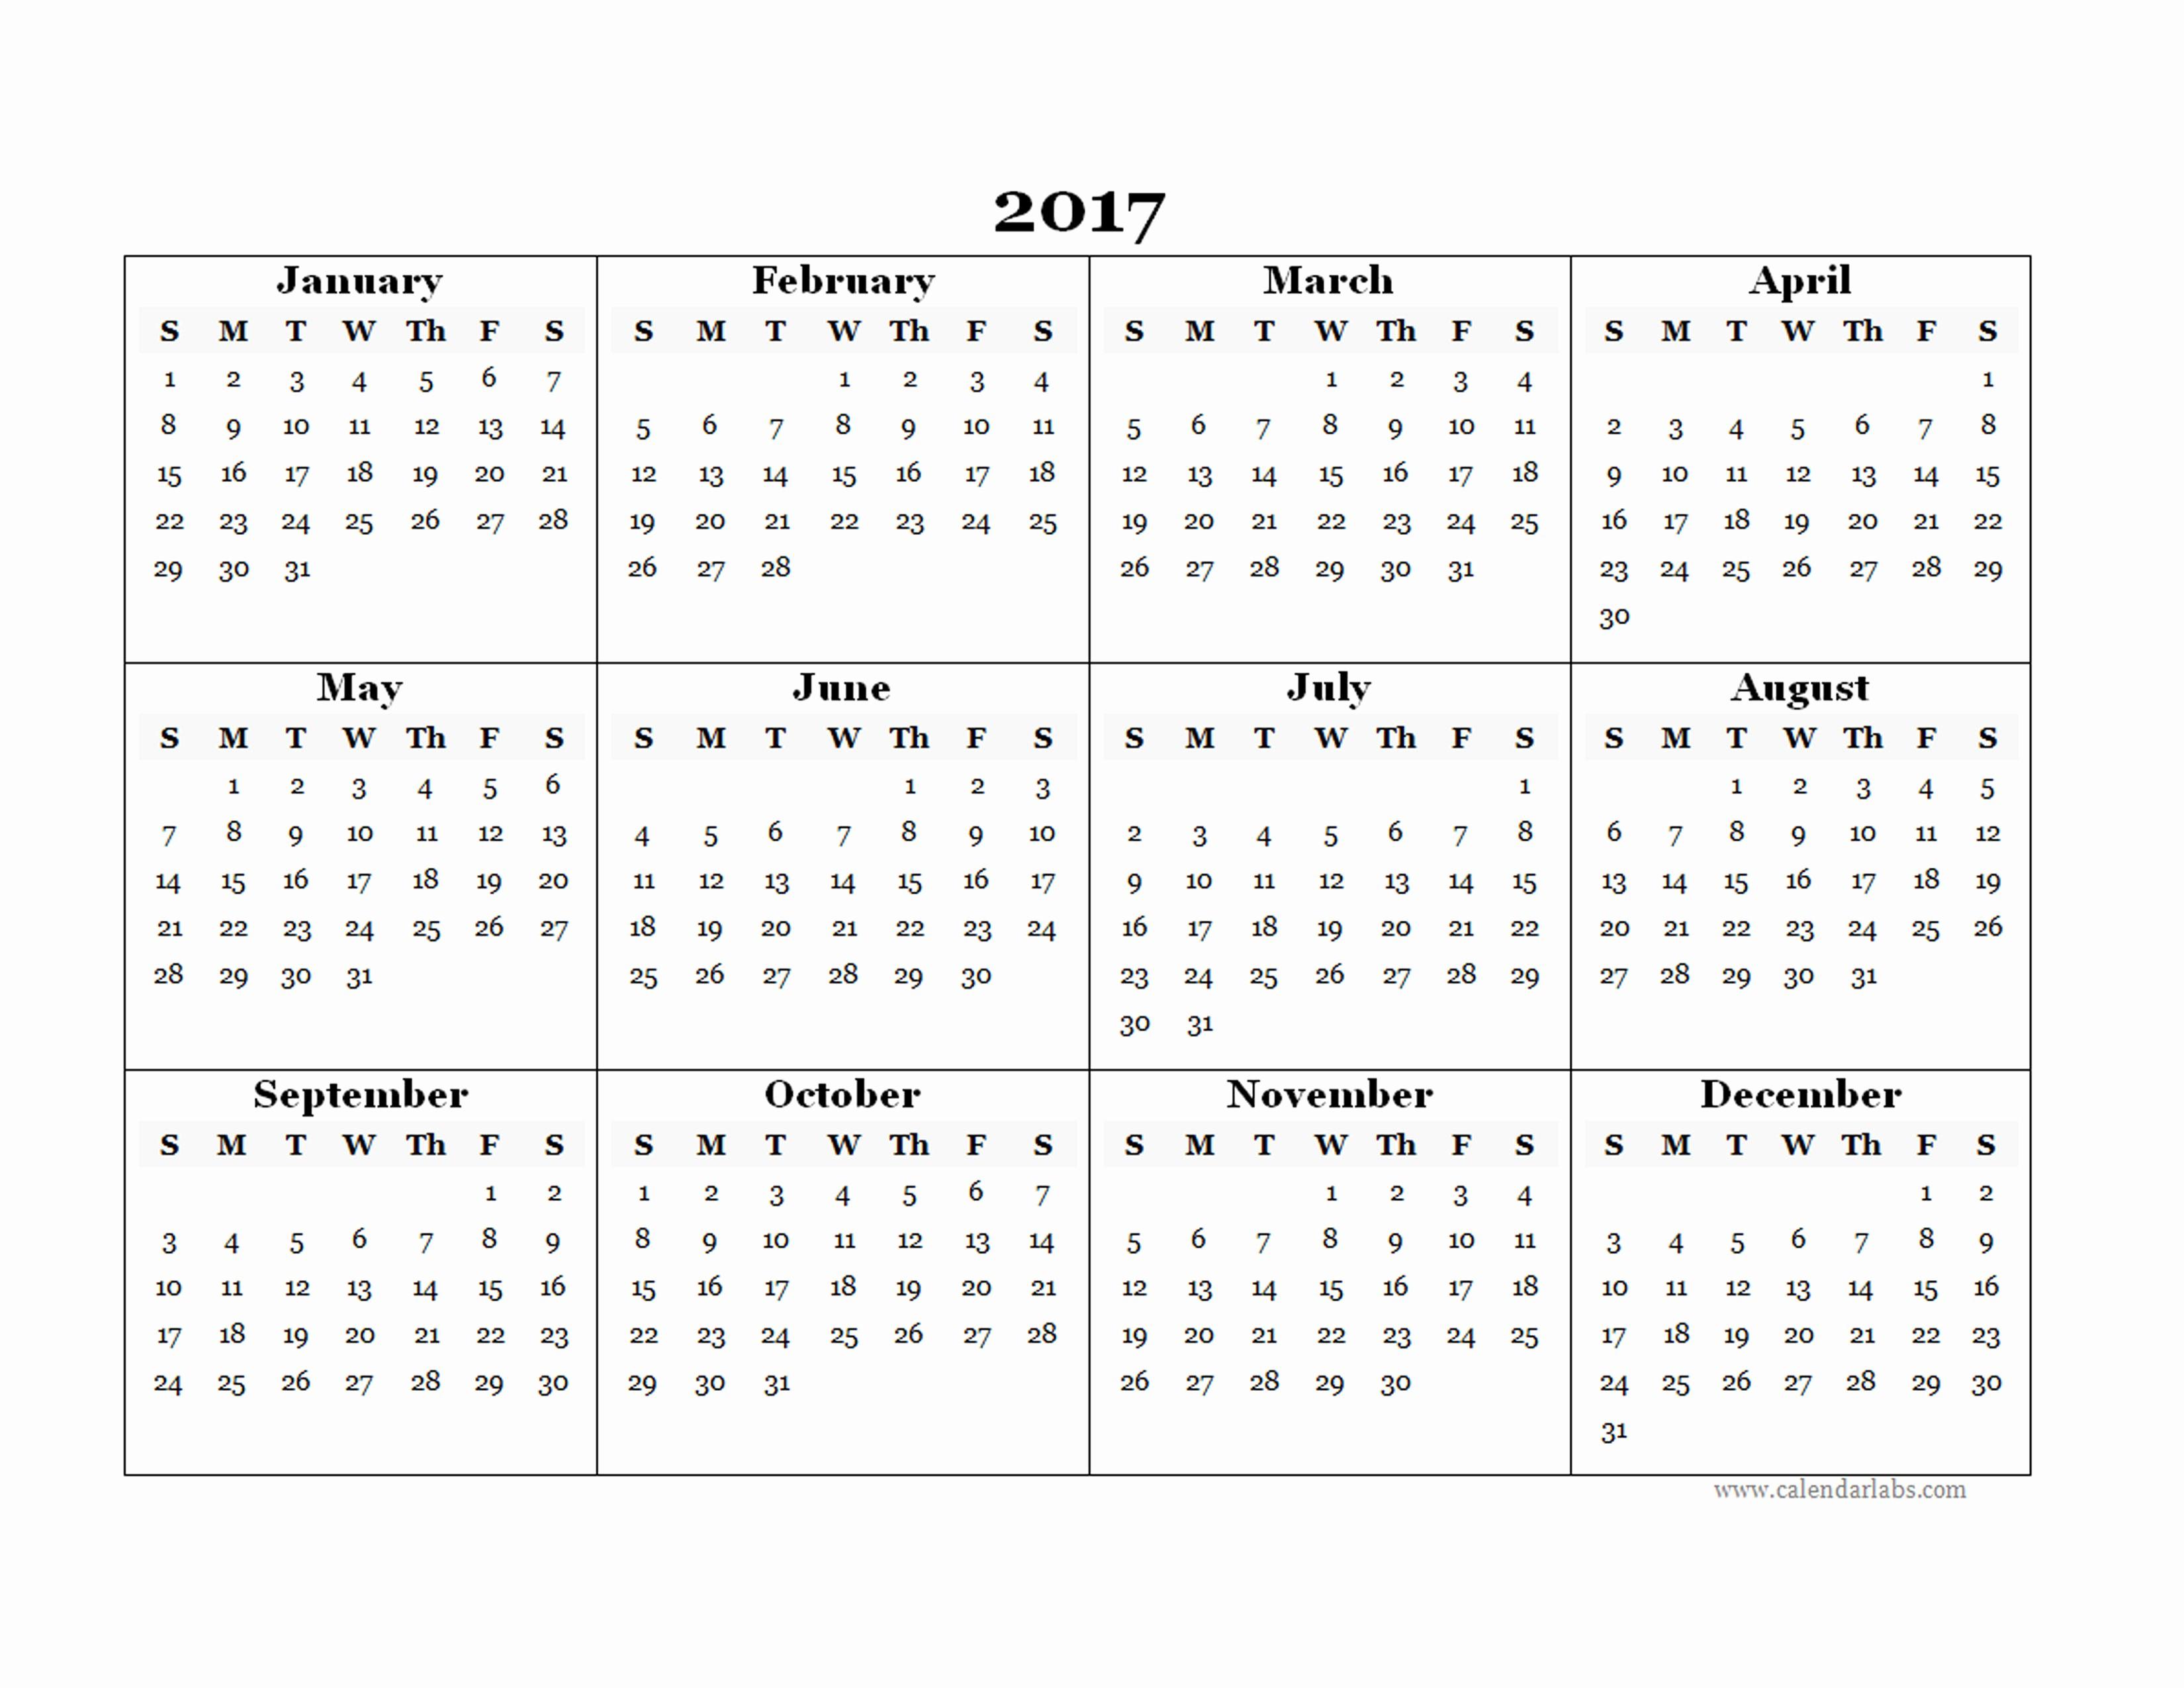 Full Year Calendar 2017 Printable Awesome 2017 Blank Yearly Calendar Template Free Printable Templates